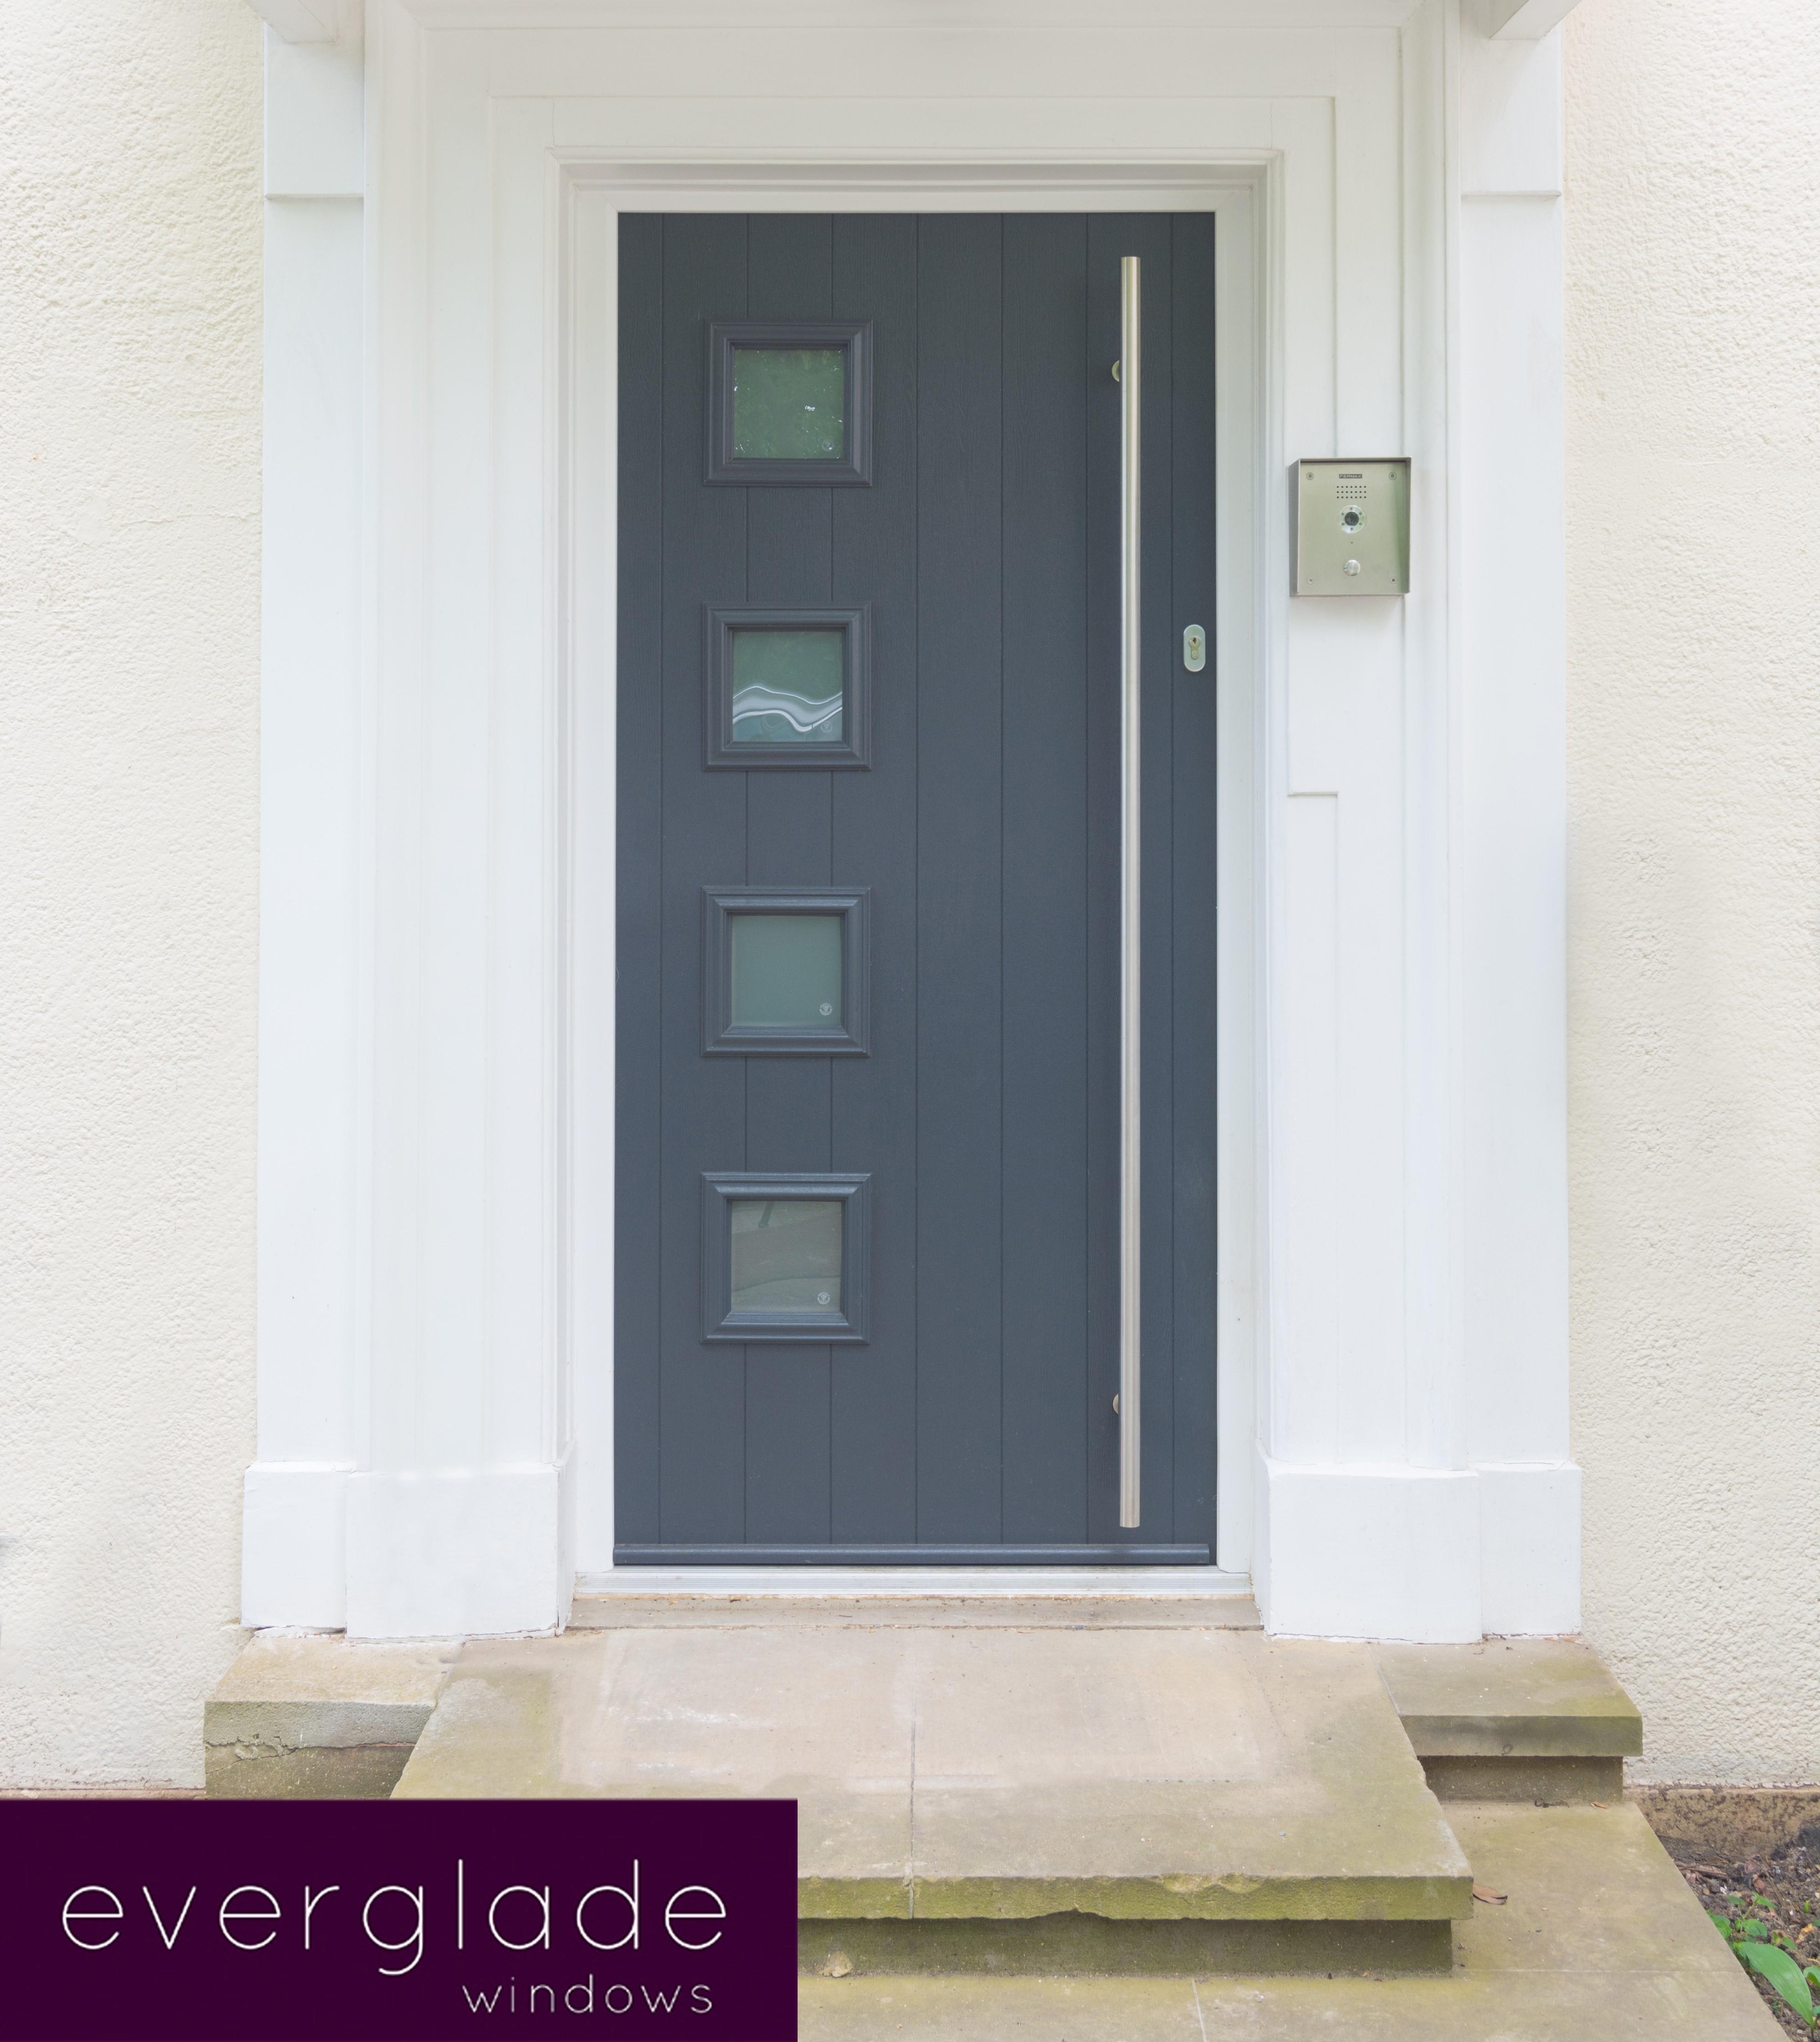 Trade Entrance Doors